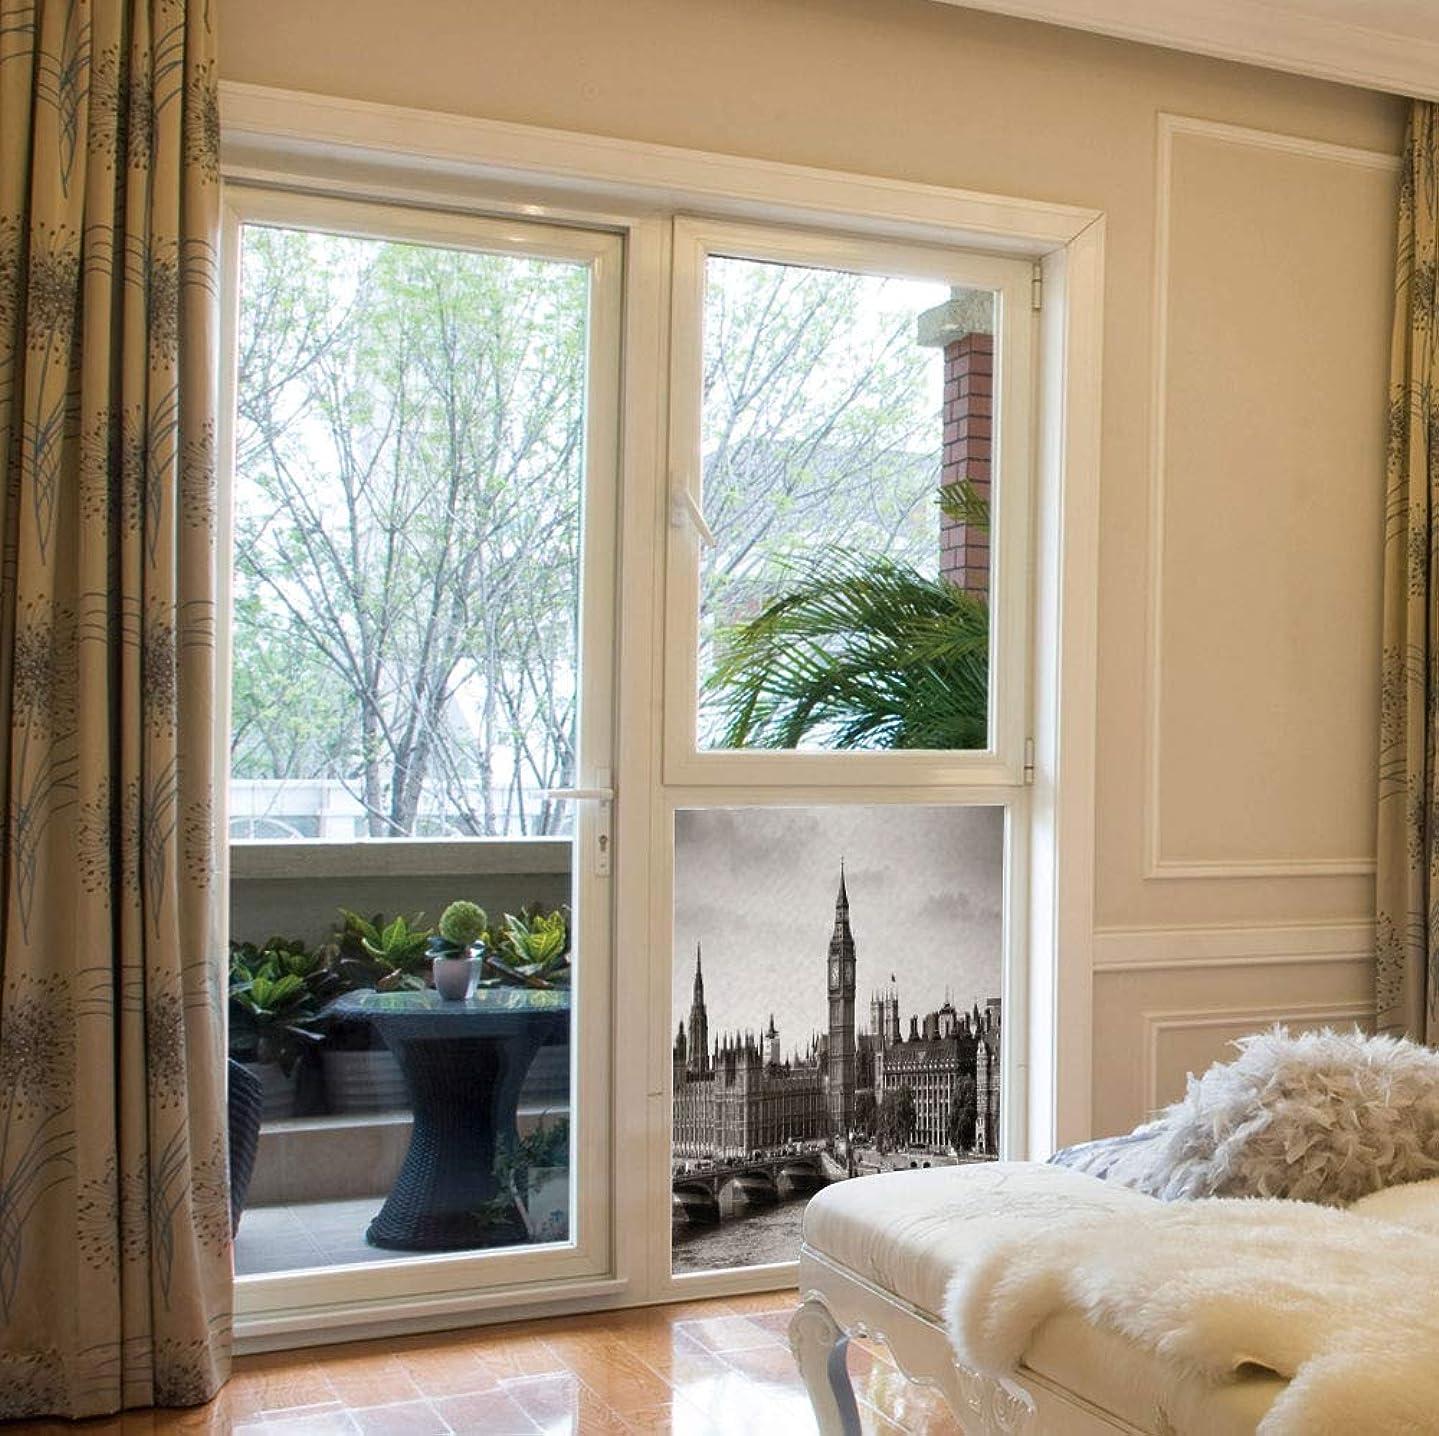 YOLIYANA Stained Glass Window Film,London,for Bathroom Shower Door Heat Cotrol Anti UV,Westminster with Big Ben and Bridge Nostalgic Image,17''x24''